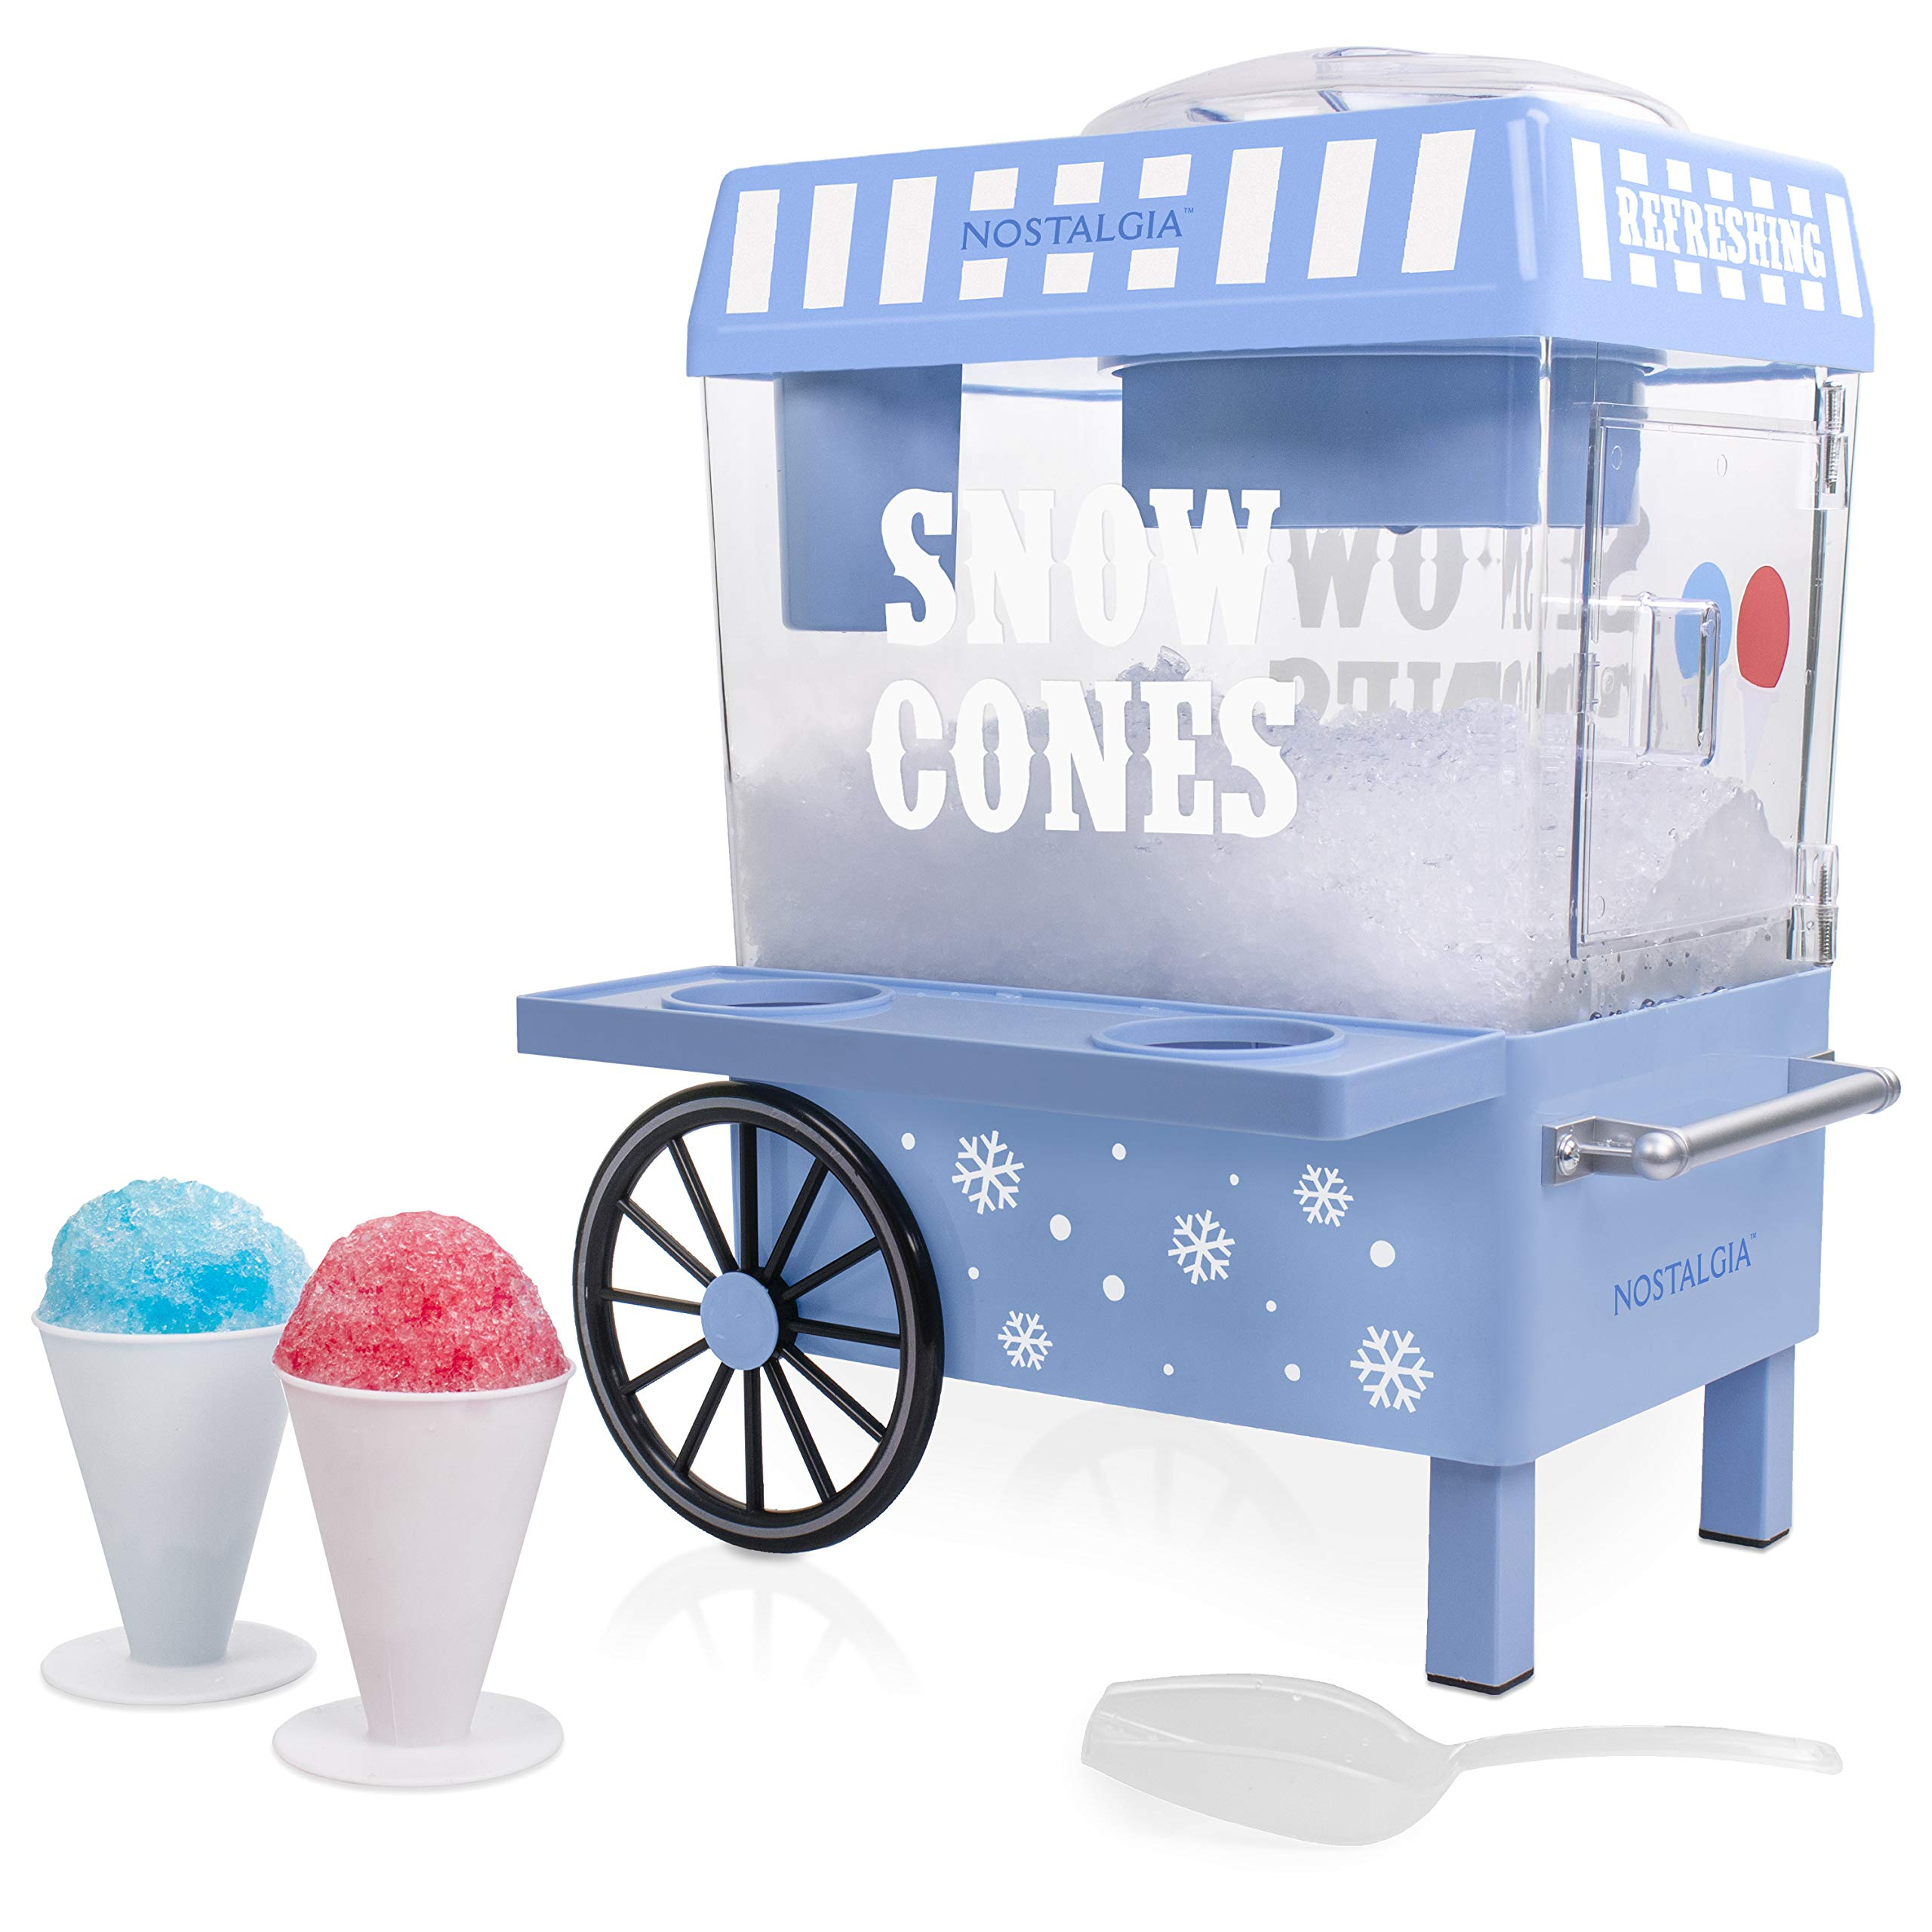 Nostalgia SCM525BL Vintage Snow Cone Maker, Blue